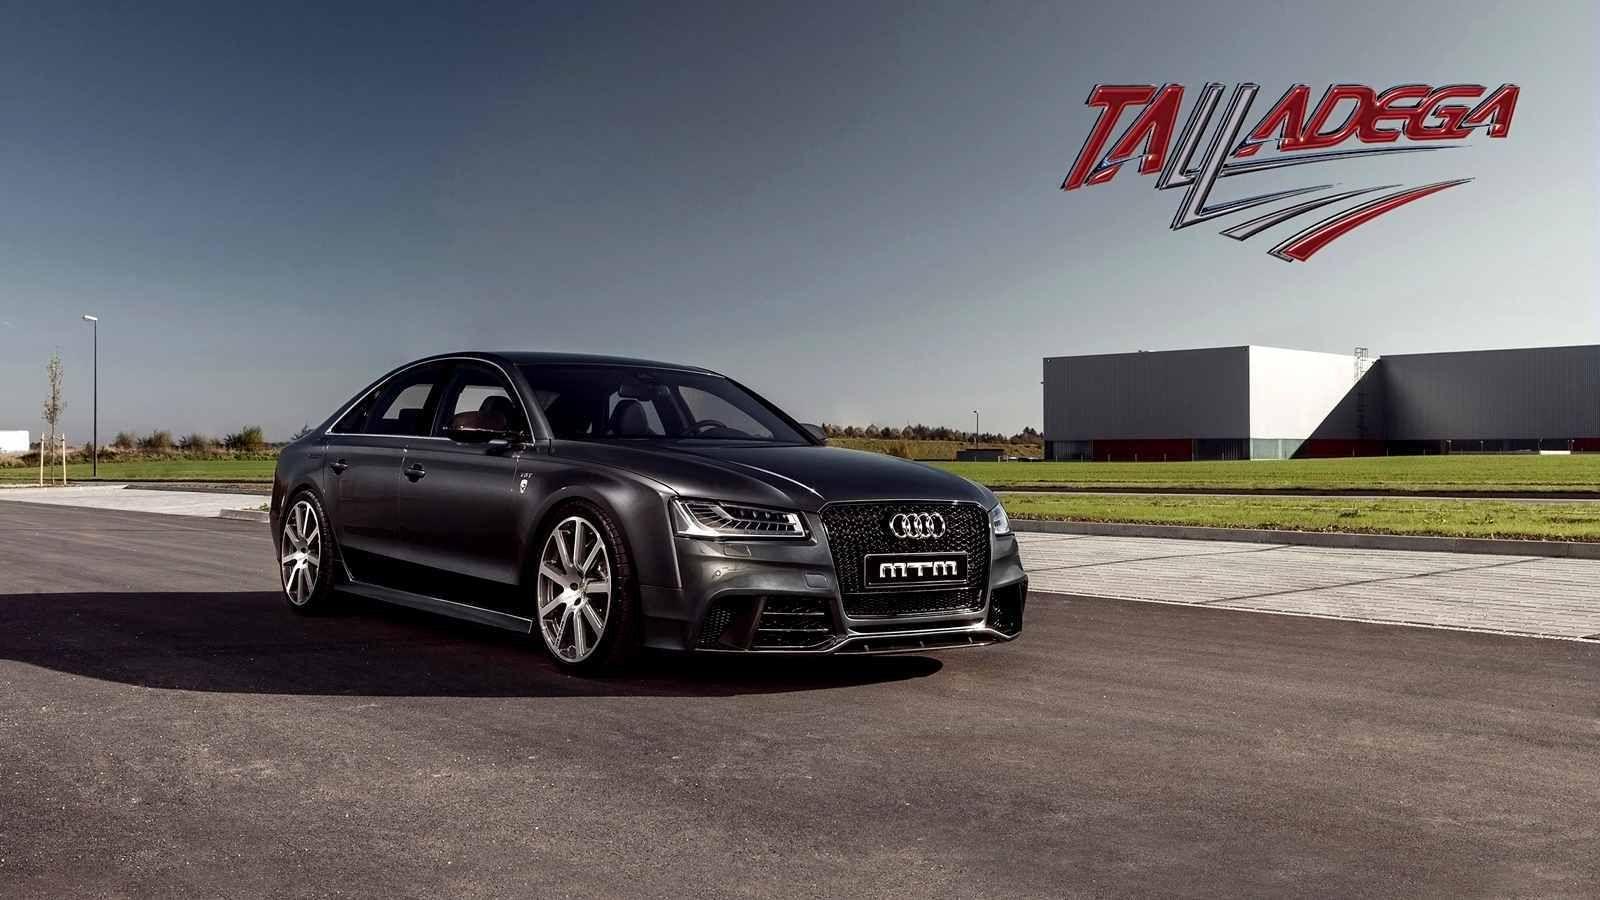 2014 Mtm Audi S8 Talladega Cool Car Wallpapers Audi A8 Audi Audi 2017